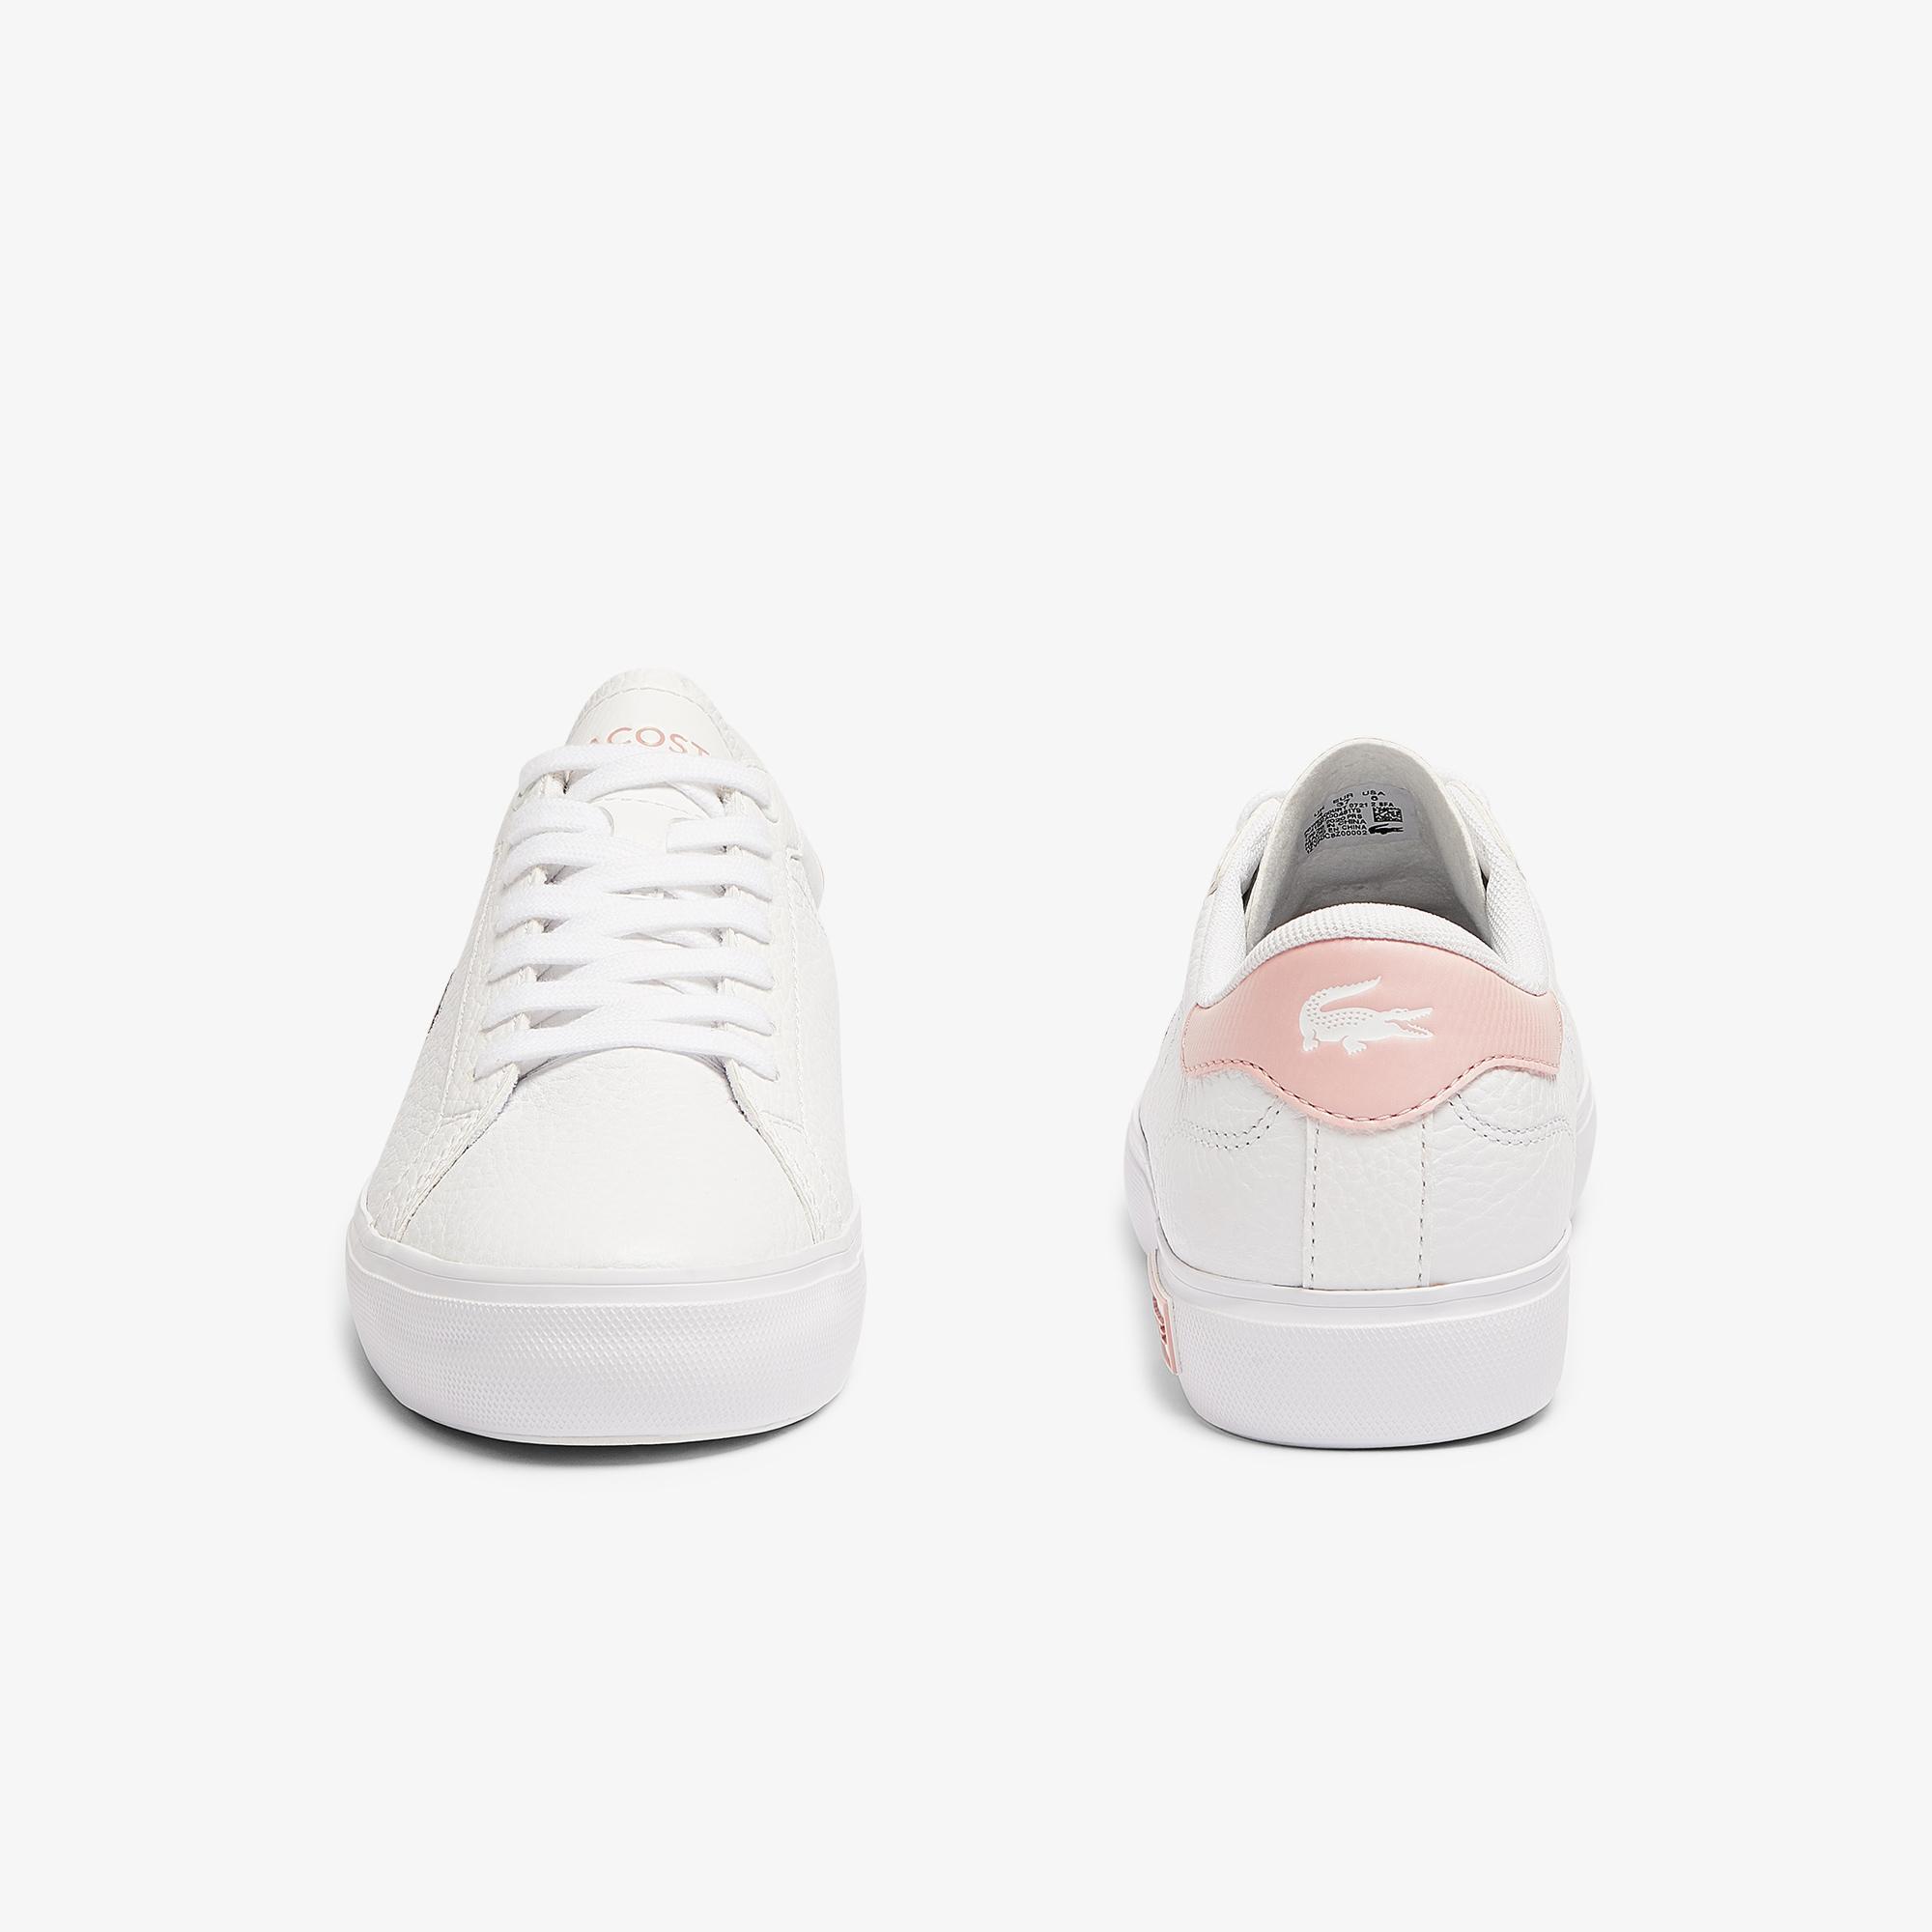 Lacoste Women's Powercourt 0721 2 Sfa Shoes